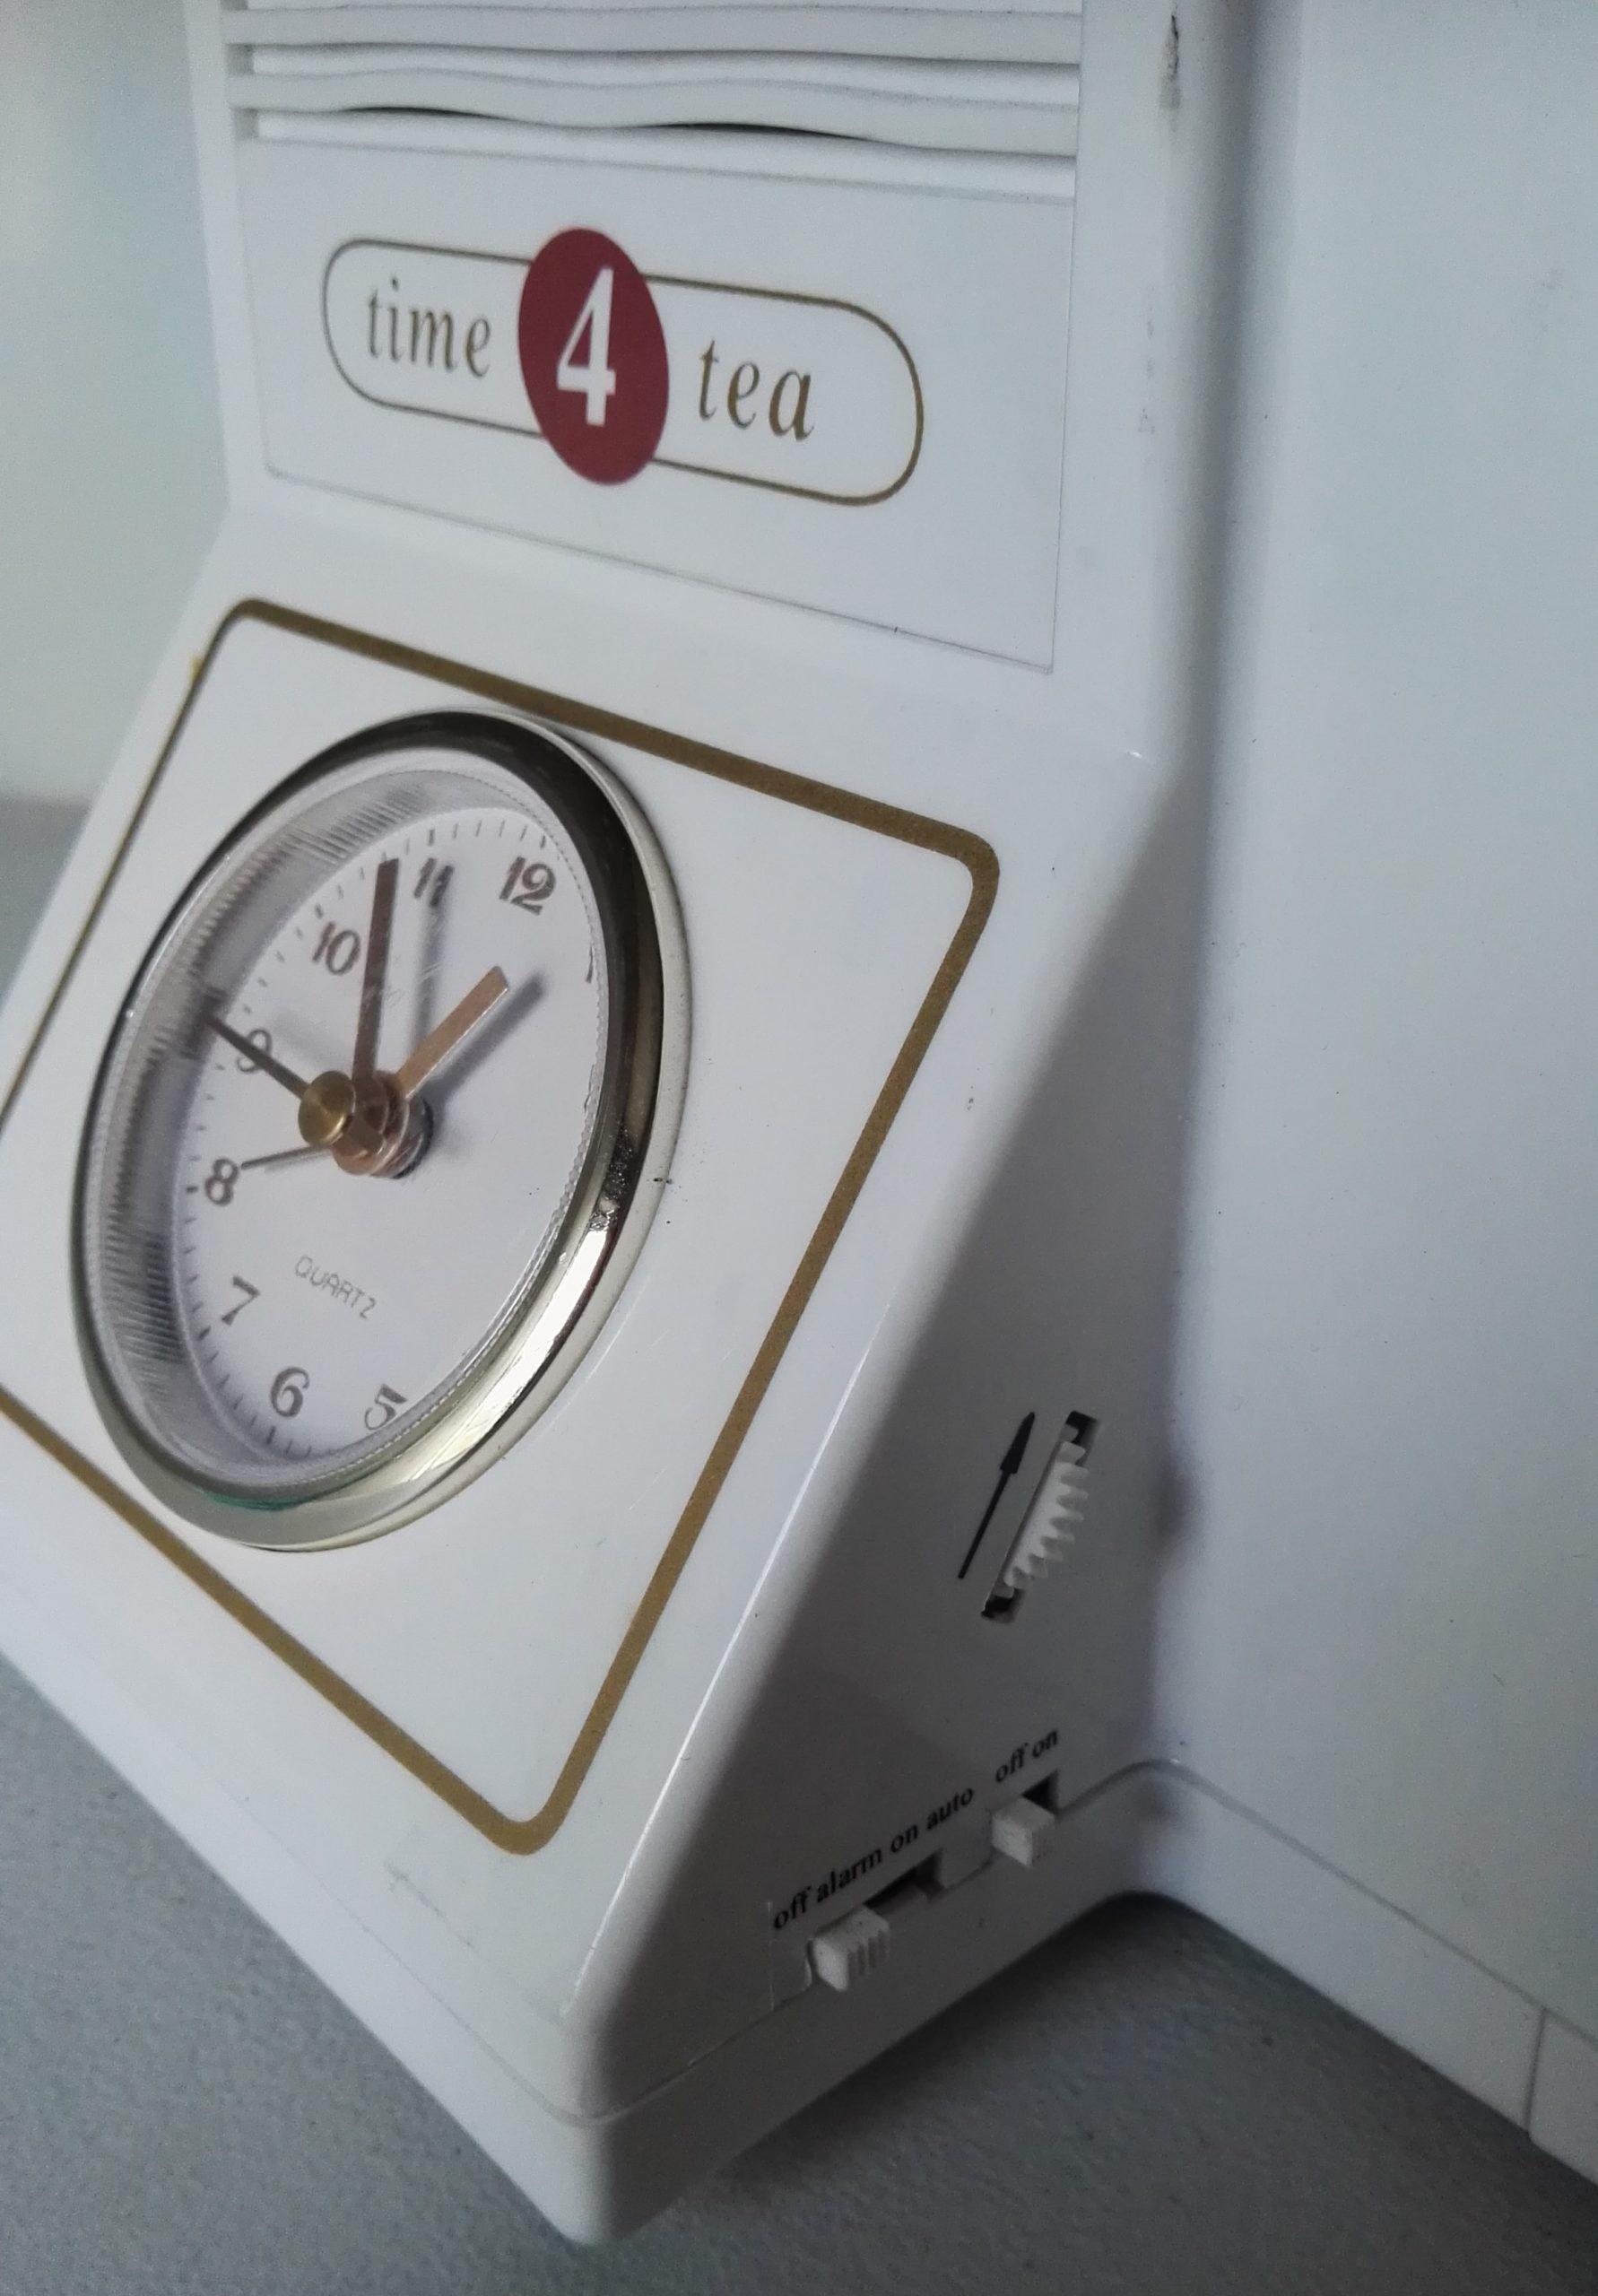 Micromark Time 4 Tea